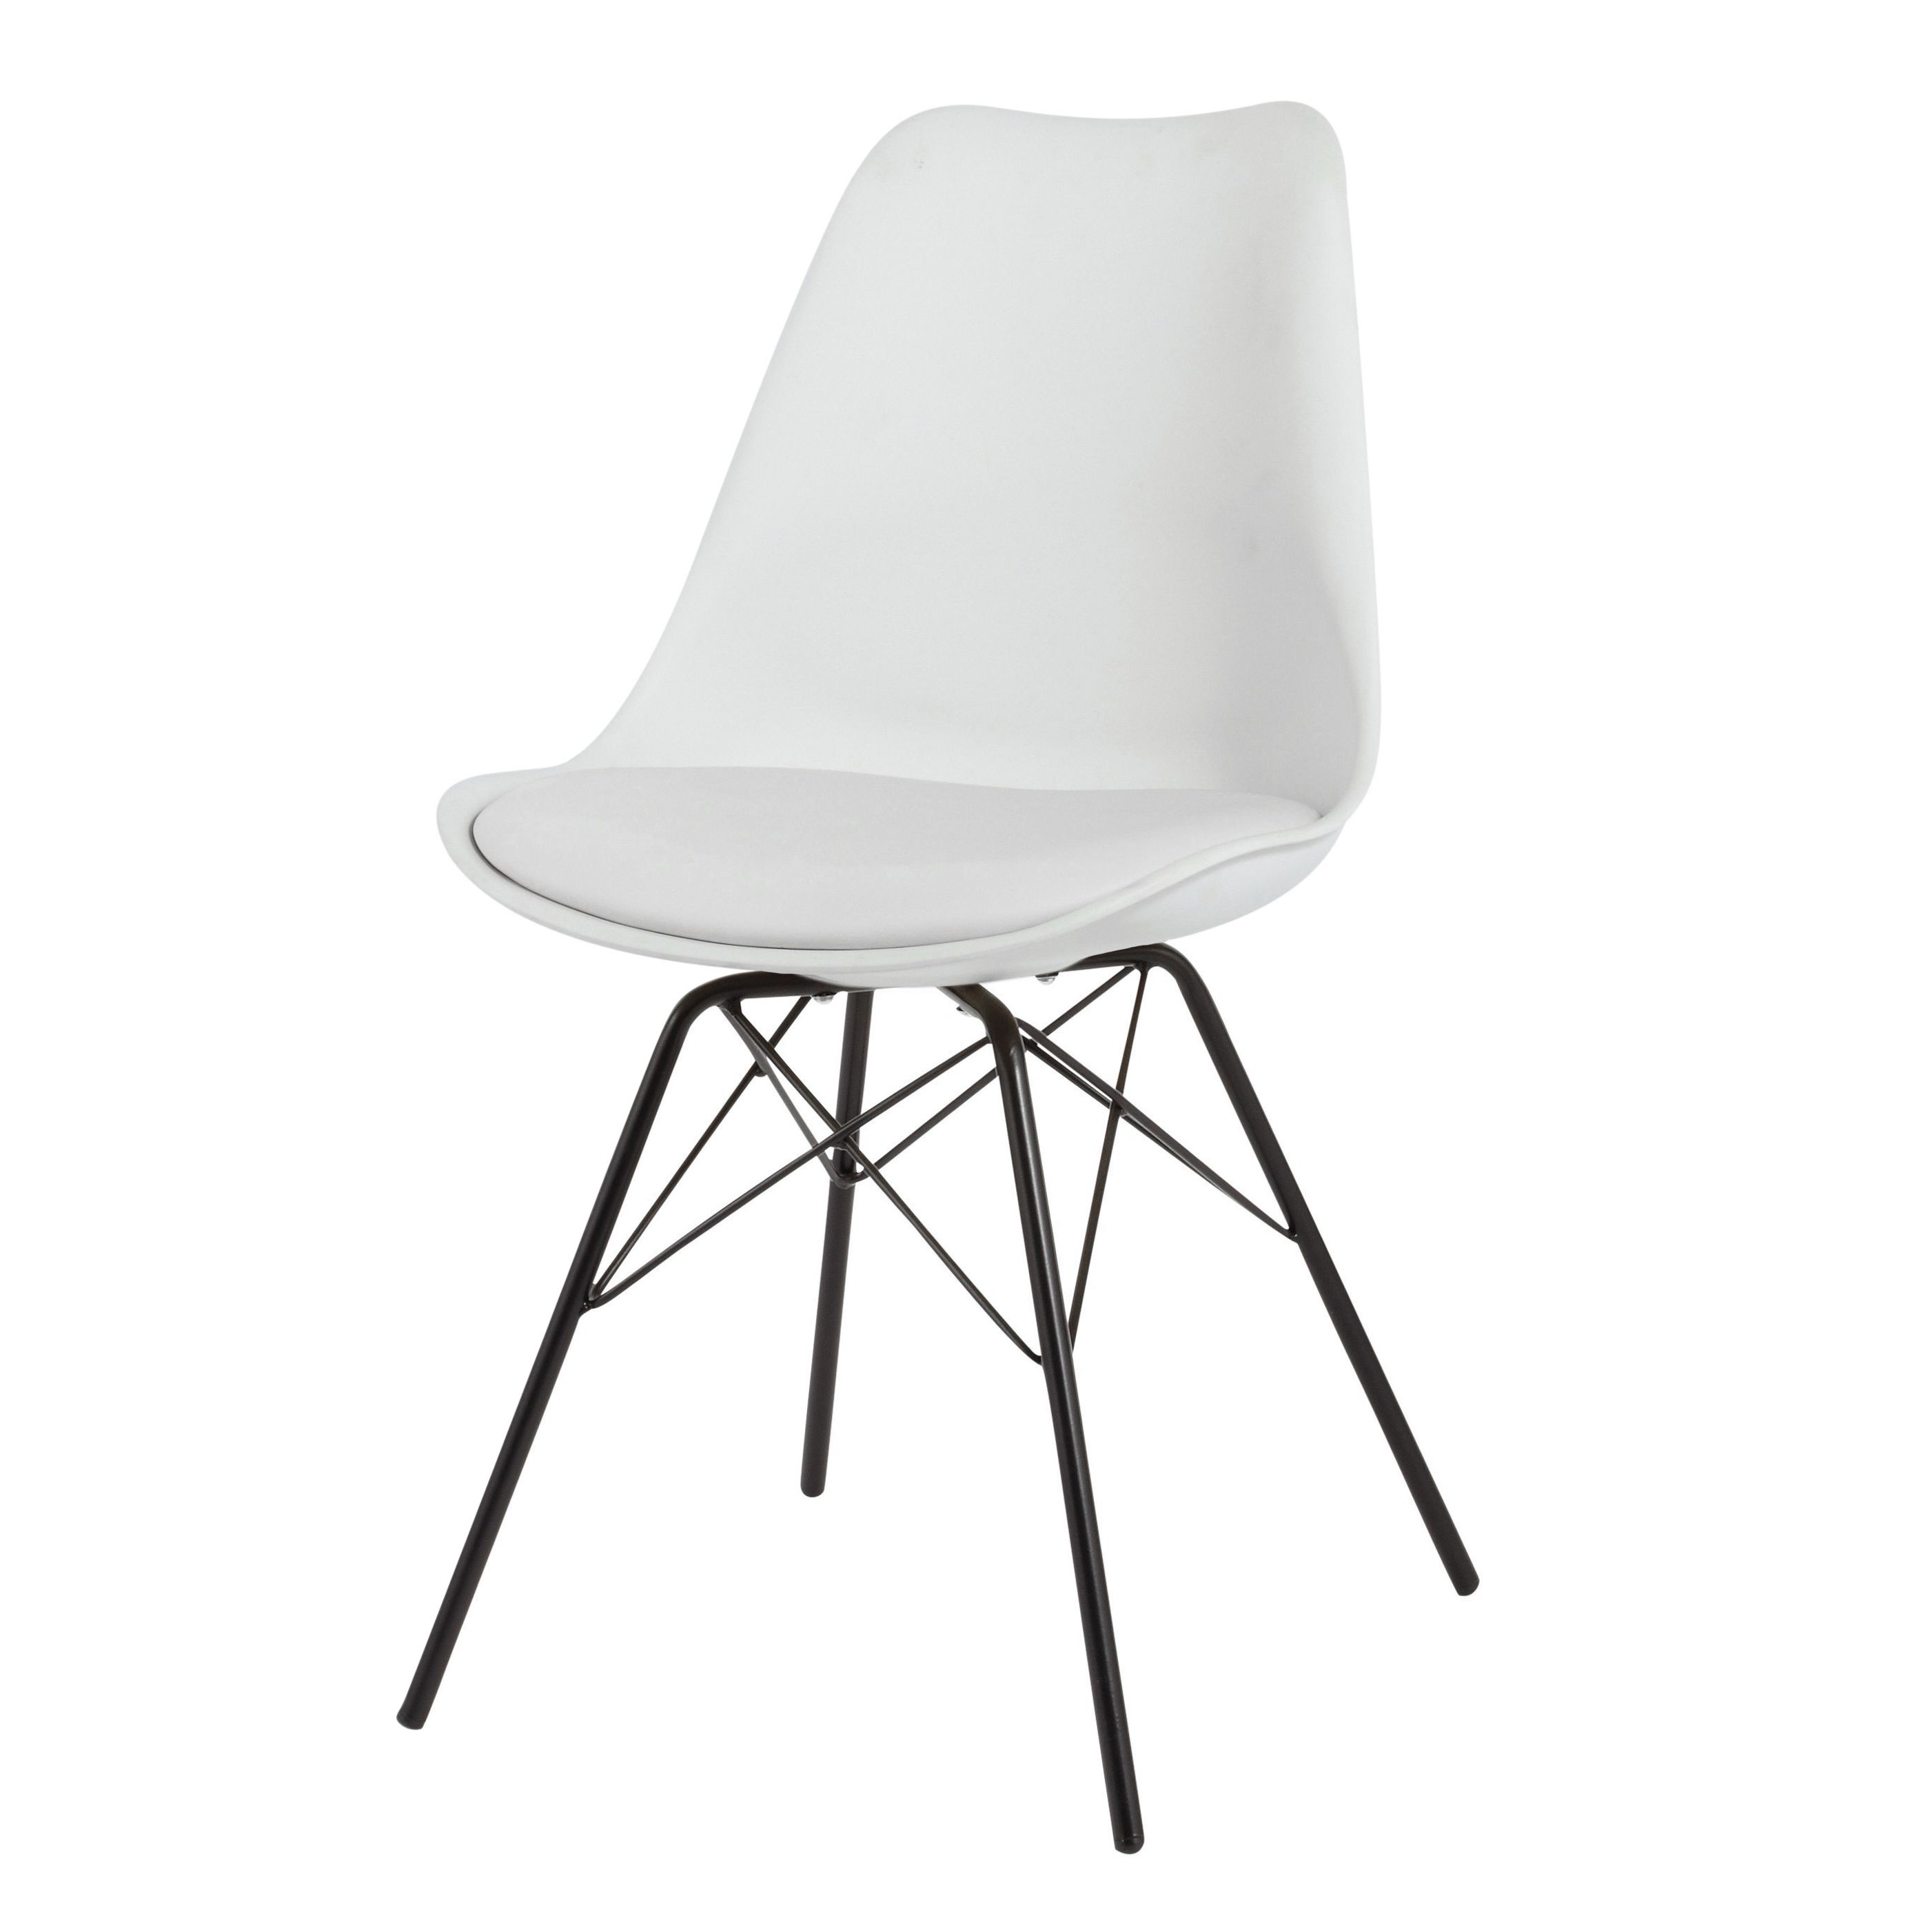 chaise blanche en polypropyl ne et m tal noir coventry nid douillet pinterest coventry. Black Bedroom Furniture Sets. Home Design Ideas